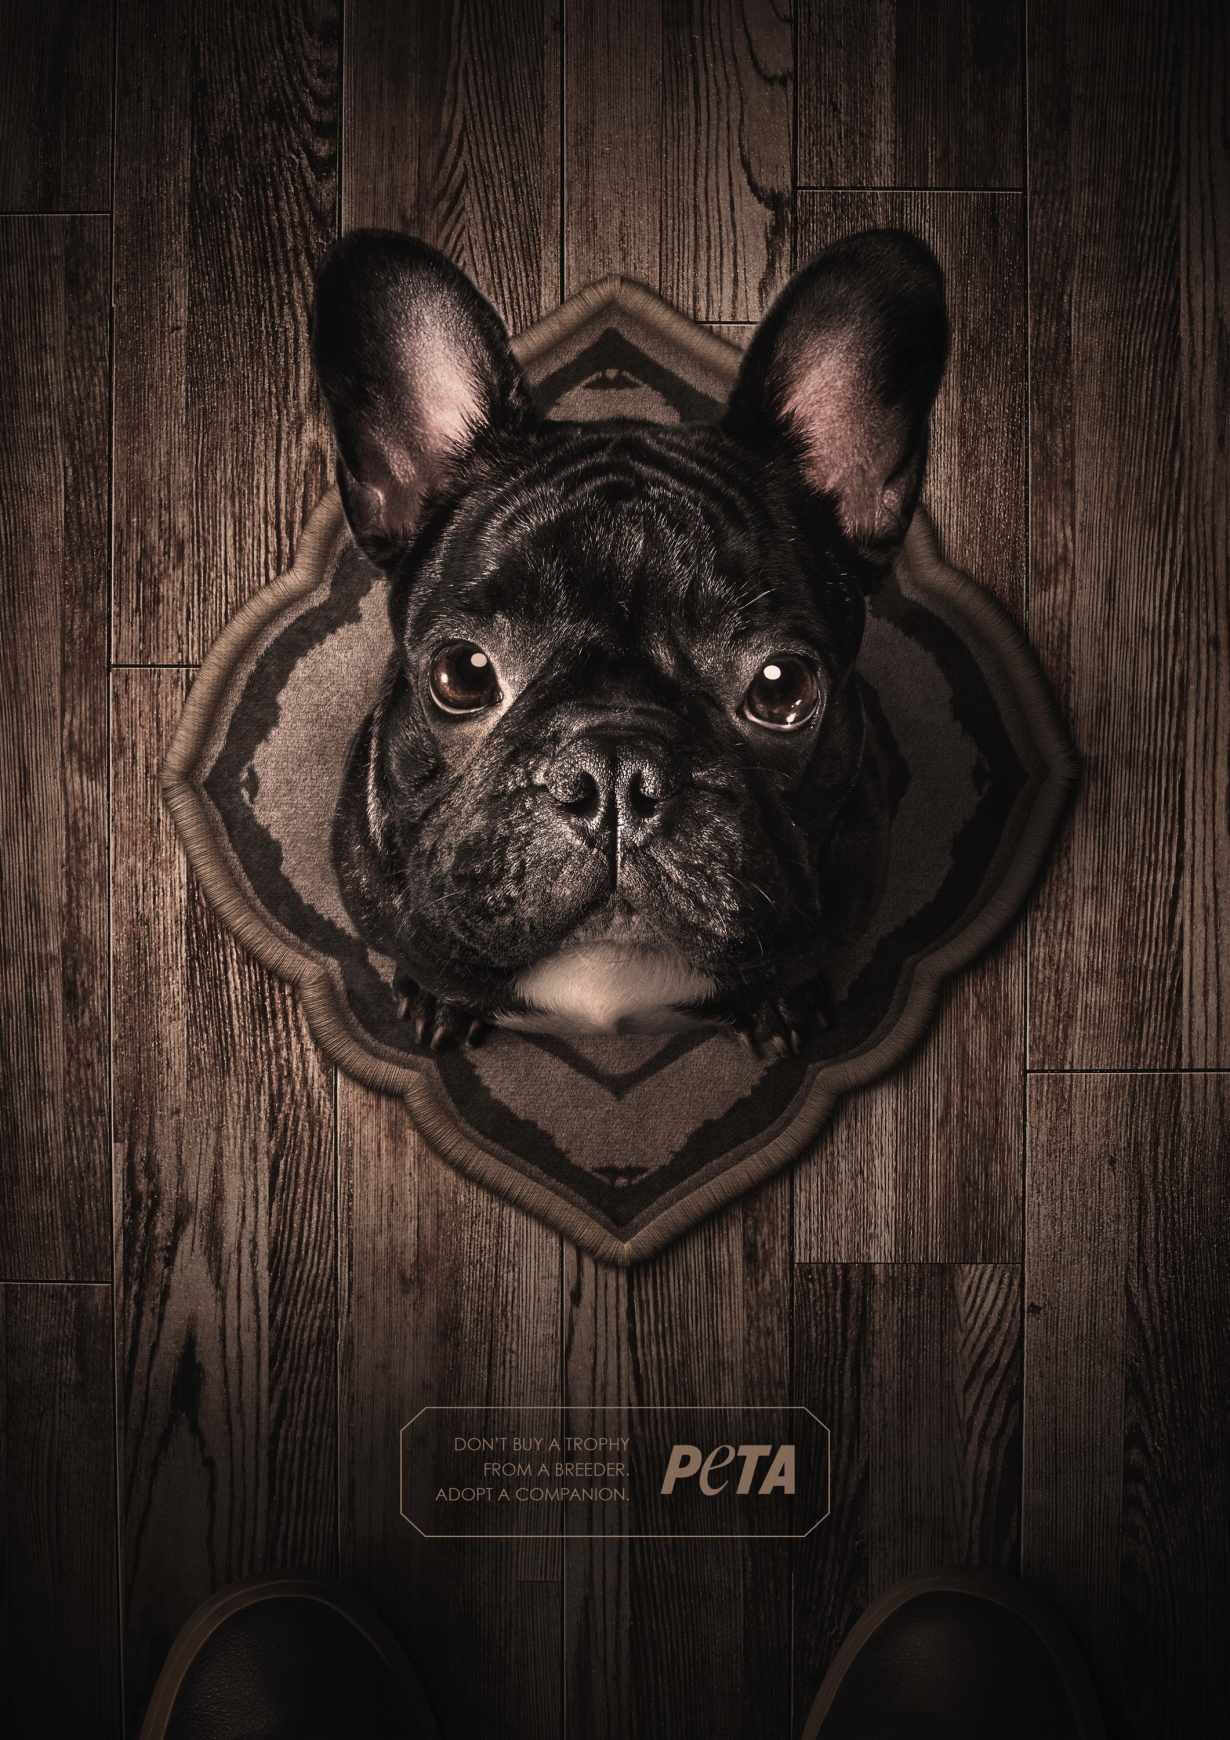 05103_lfsbr_yr_peta_cannes_bulldog_rtf_rgb_aotw.jpg